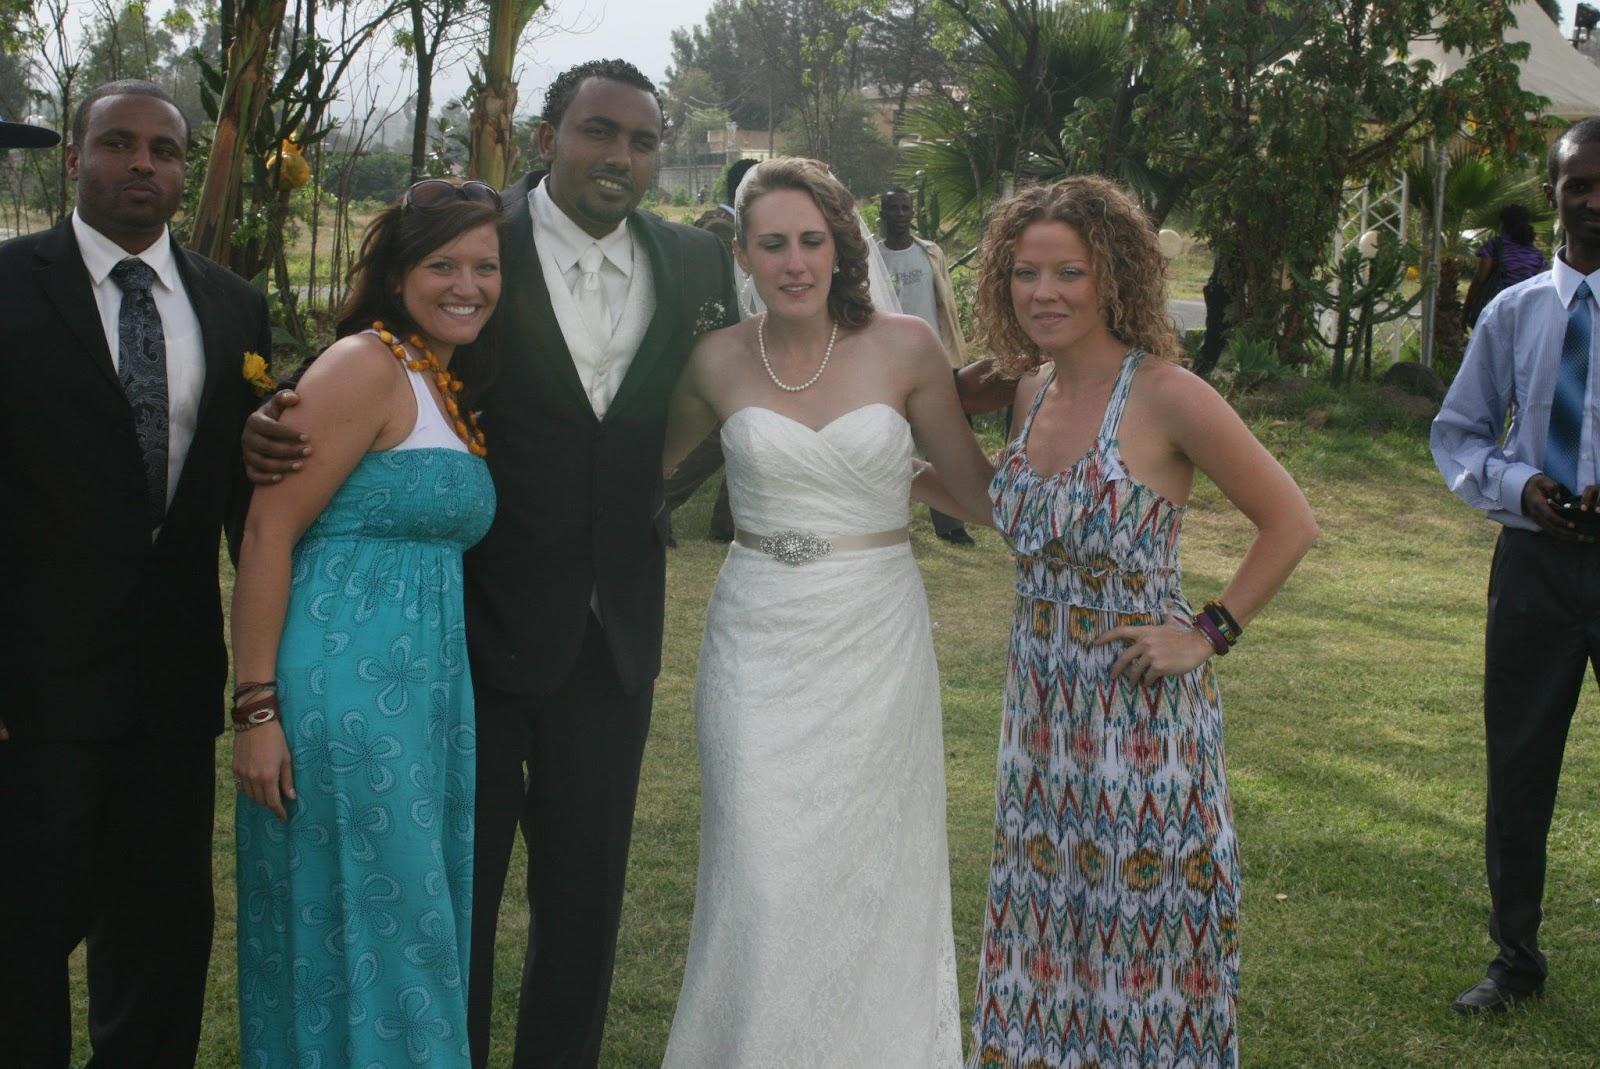 Seid berhanu wedding